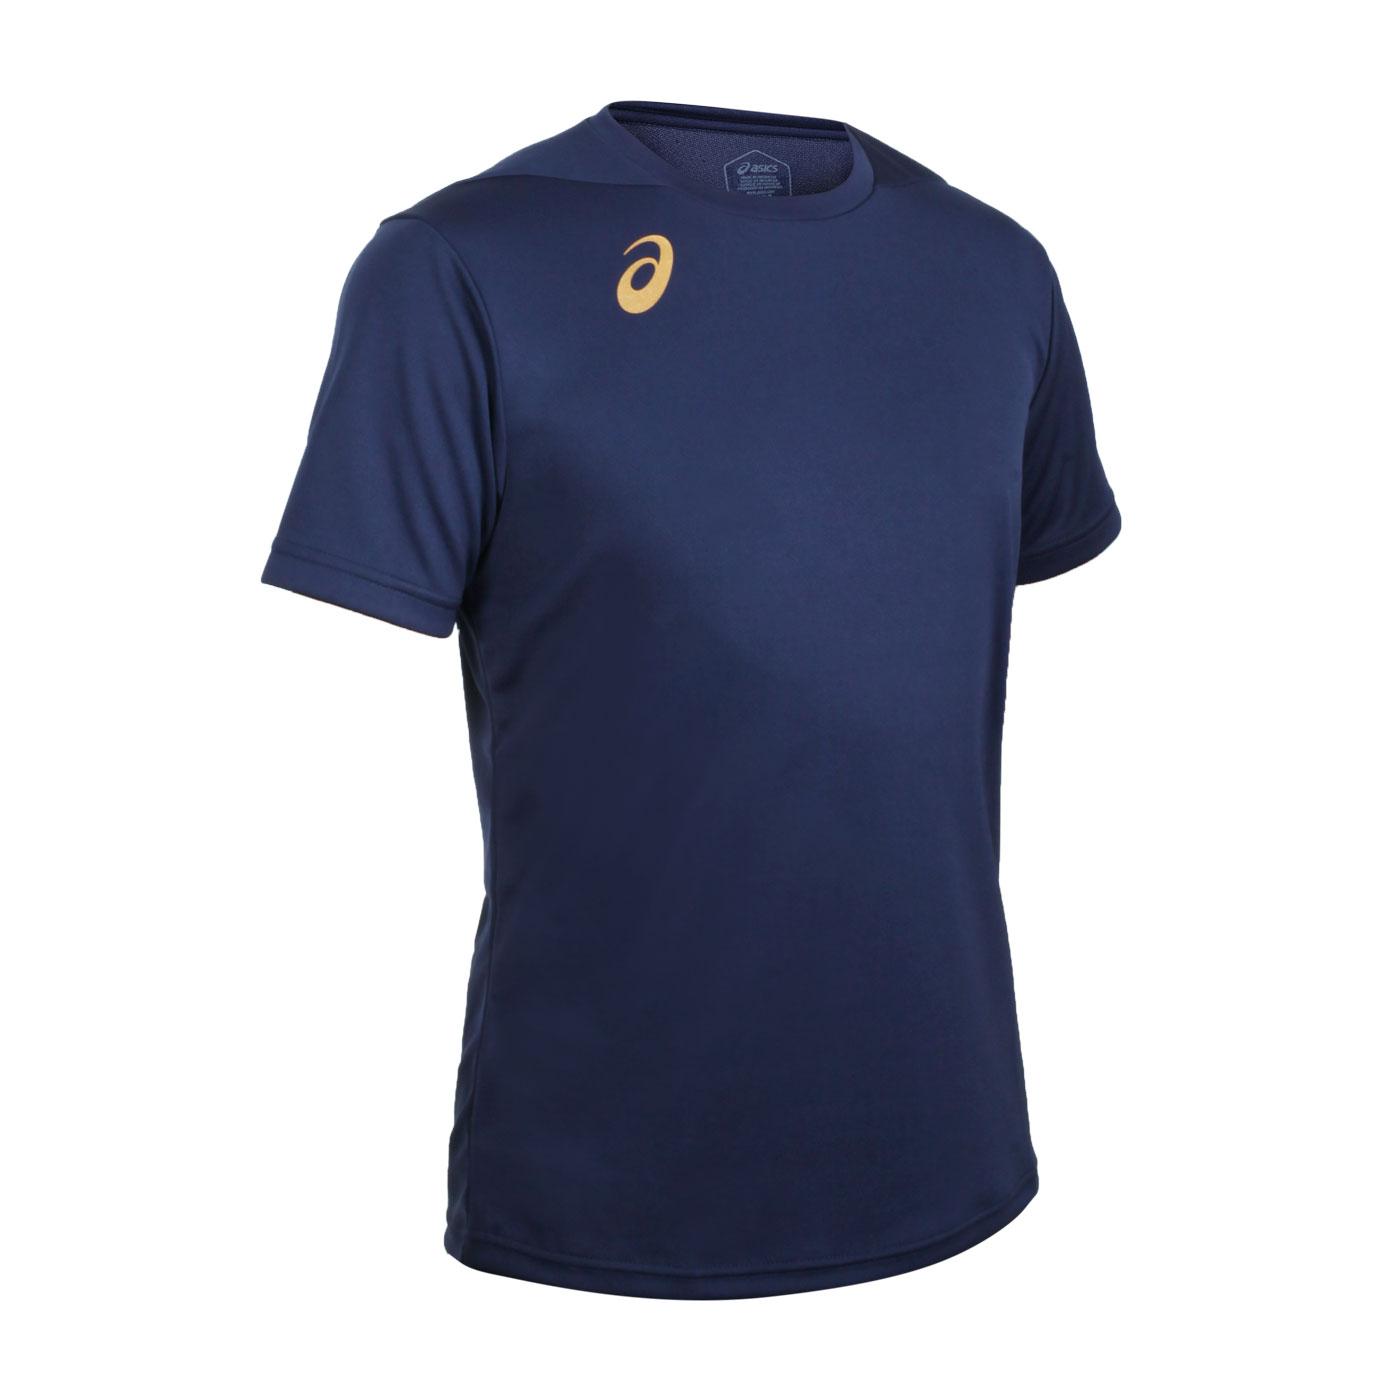 ASICS 男款排羽球短袖T恤 2051A270-400 - 丈青金